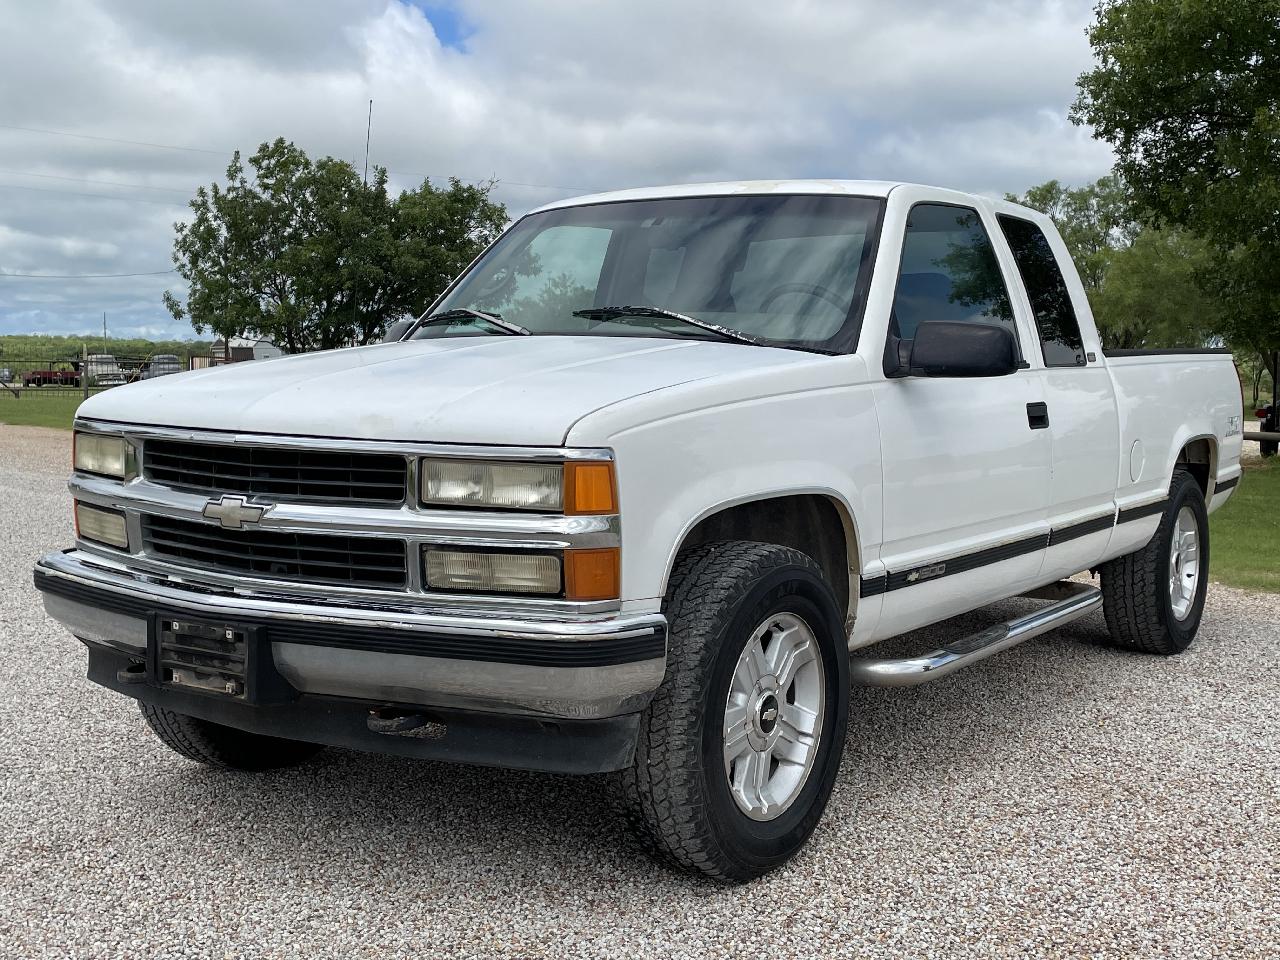 1996 Chevrolet C/K 1500 1500